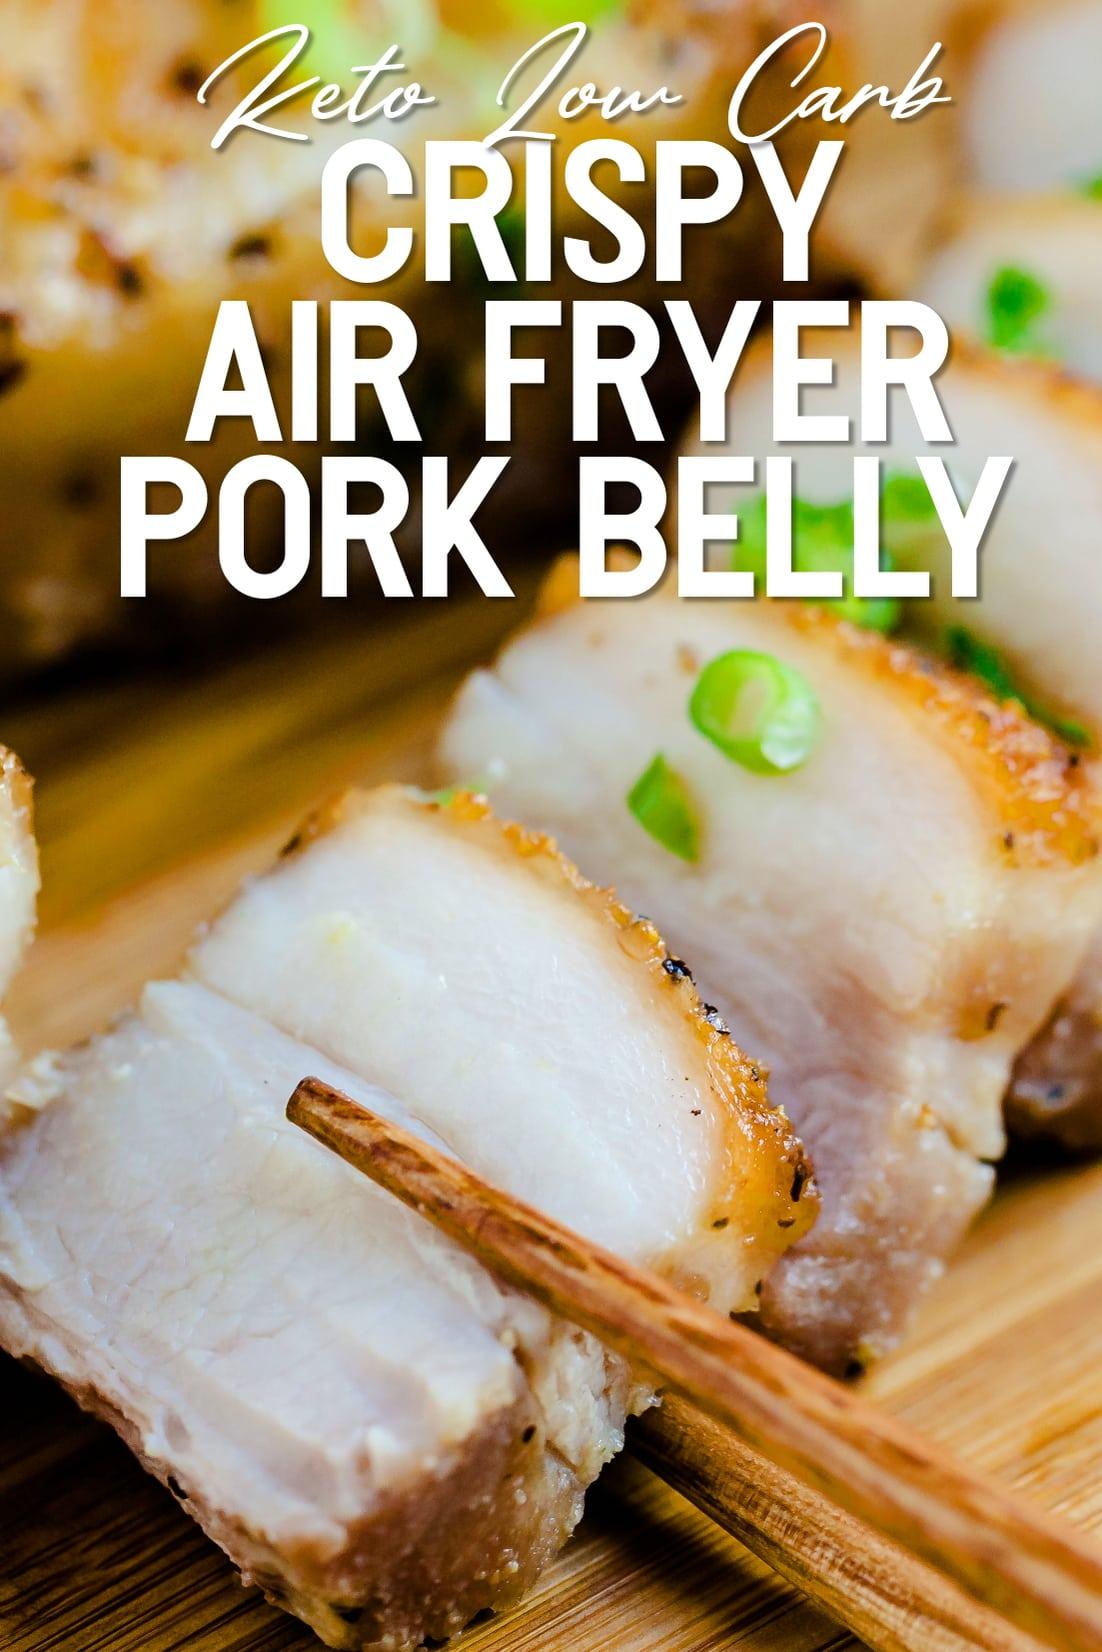 Crispy Pork Belly being held up by chopsticks